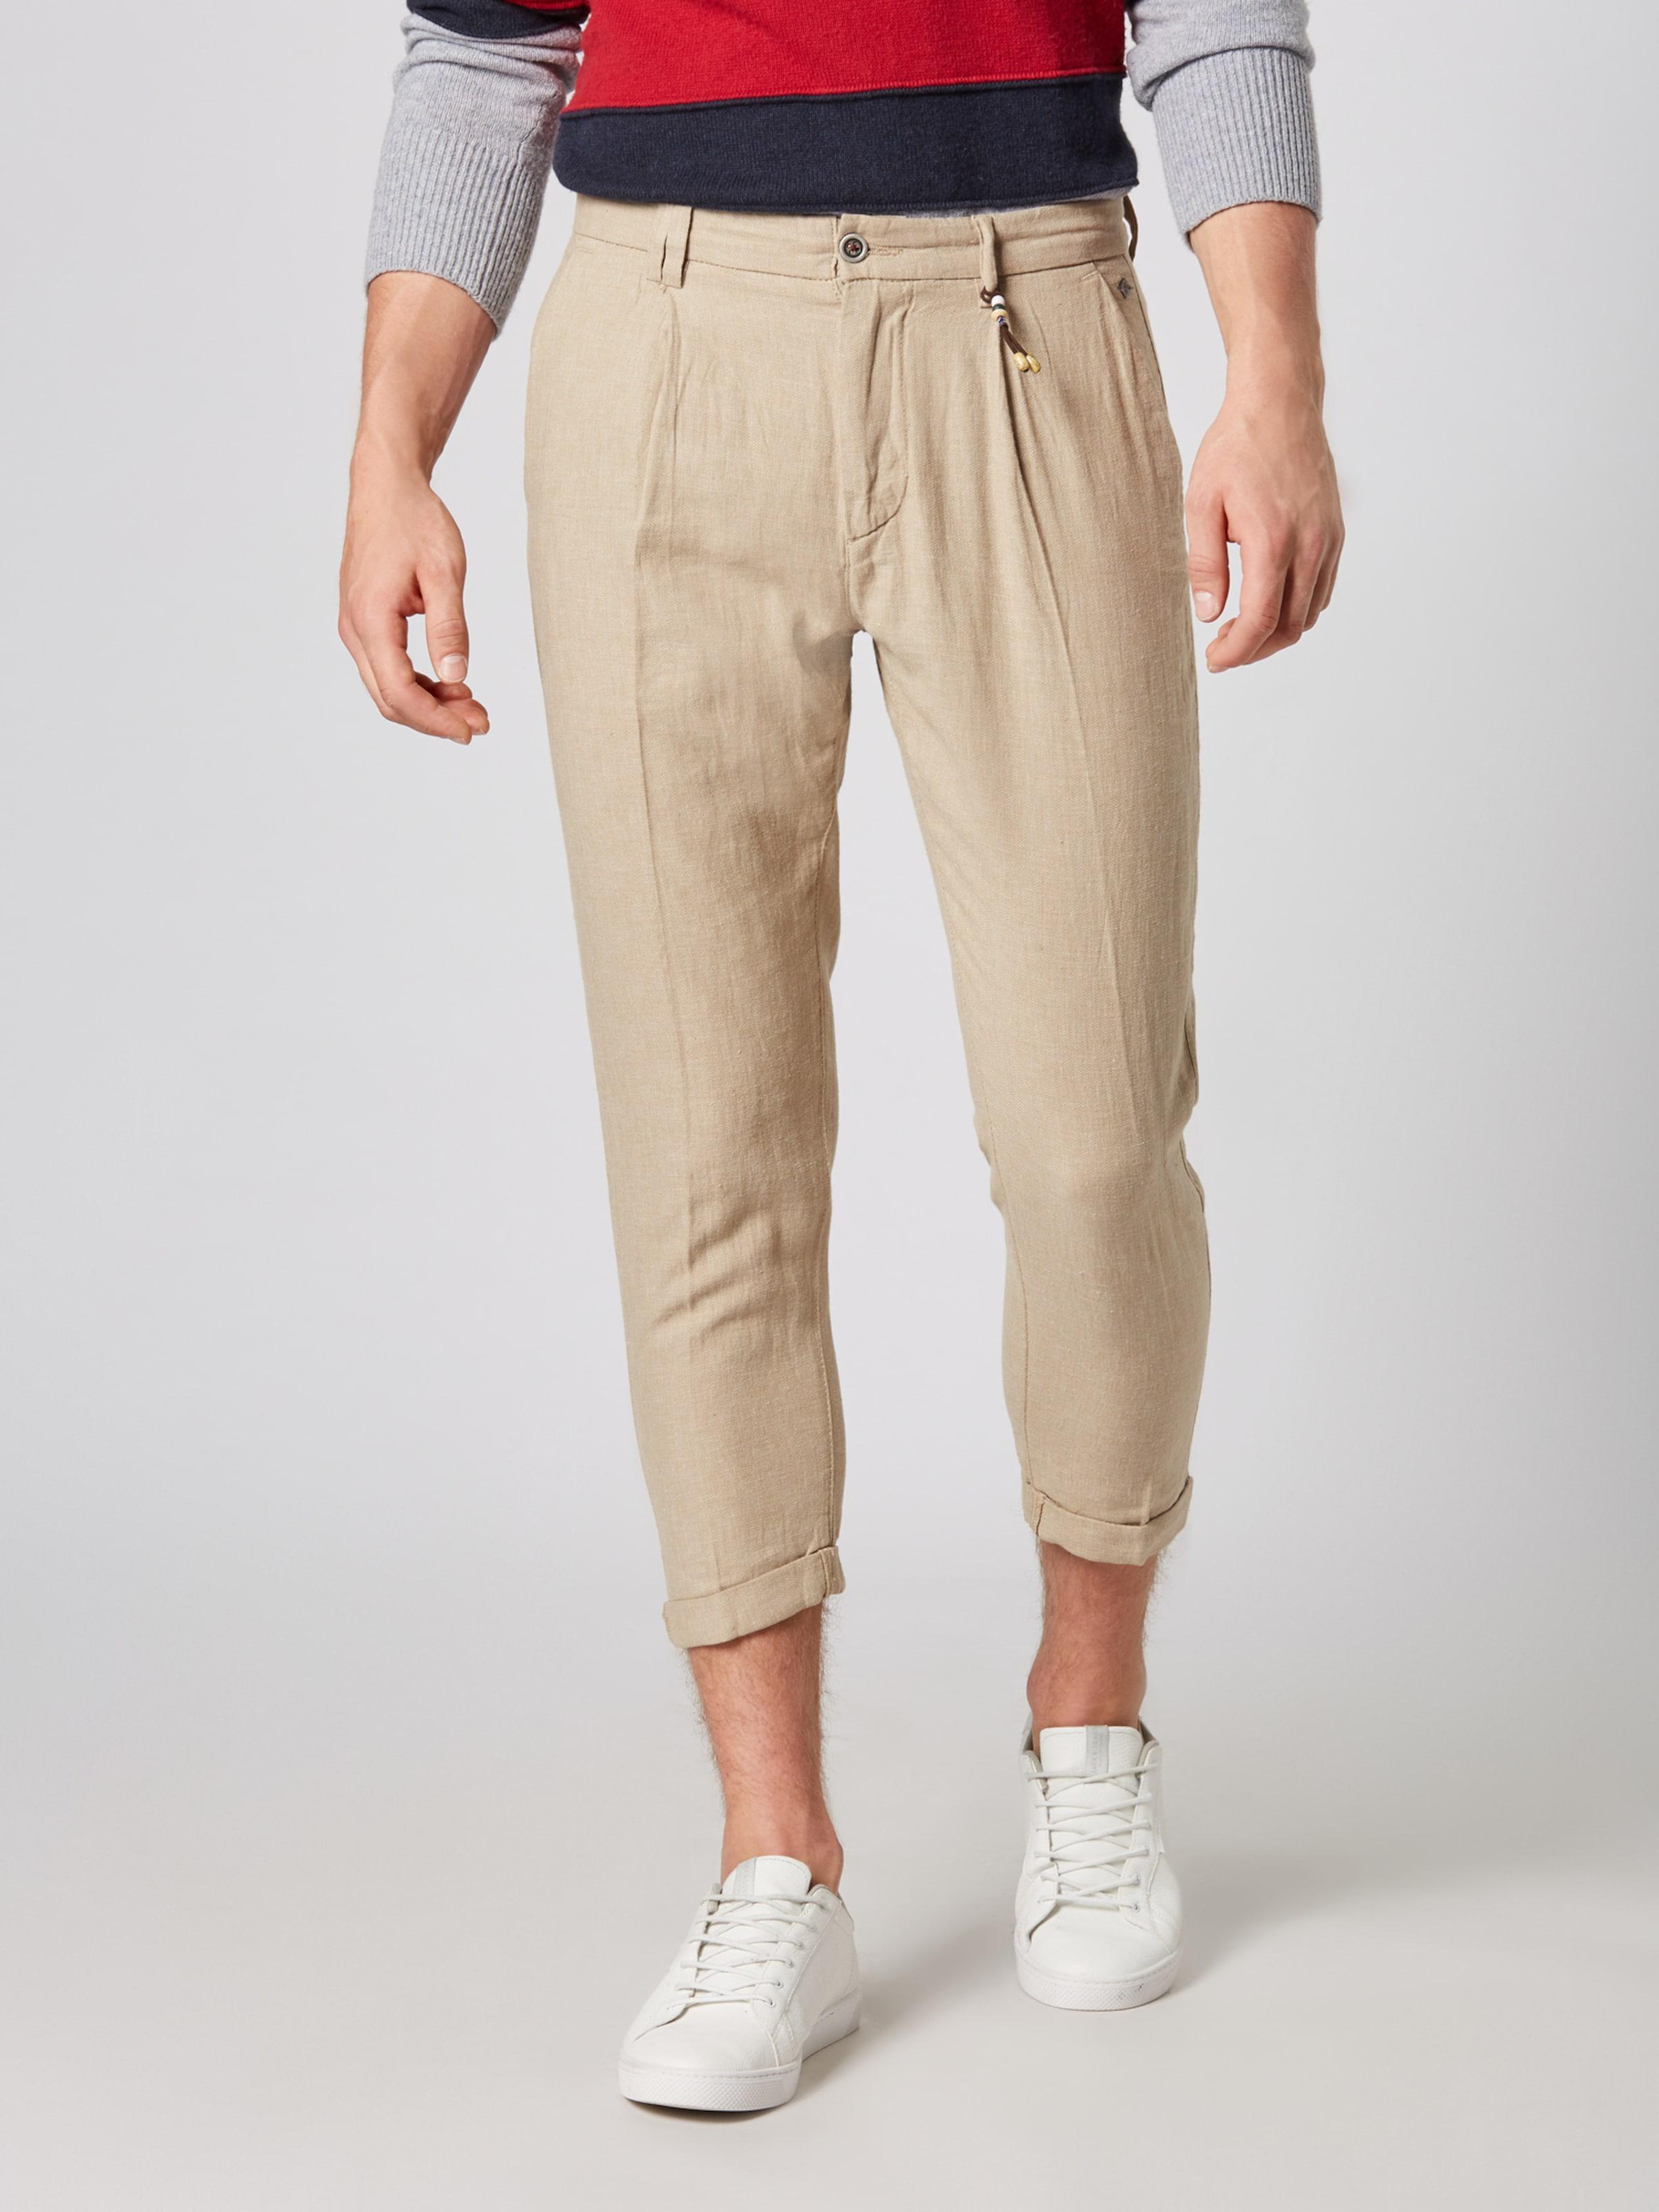 BeigeNoisette 'milton' Chino Jones En Pantalon Jackamp; w8N0OnXPk